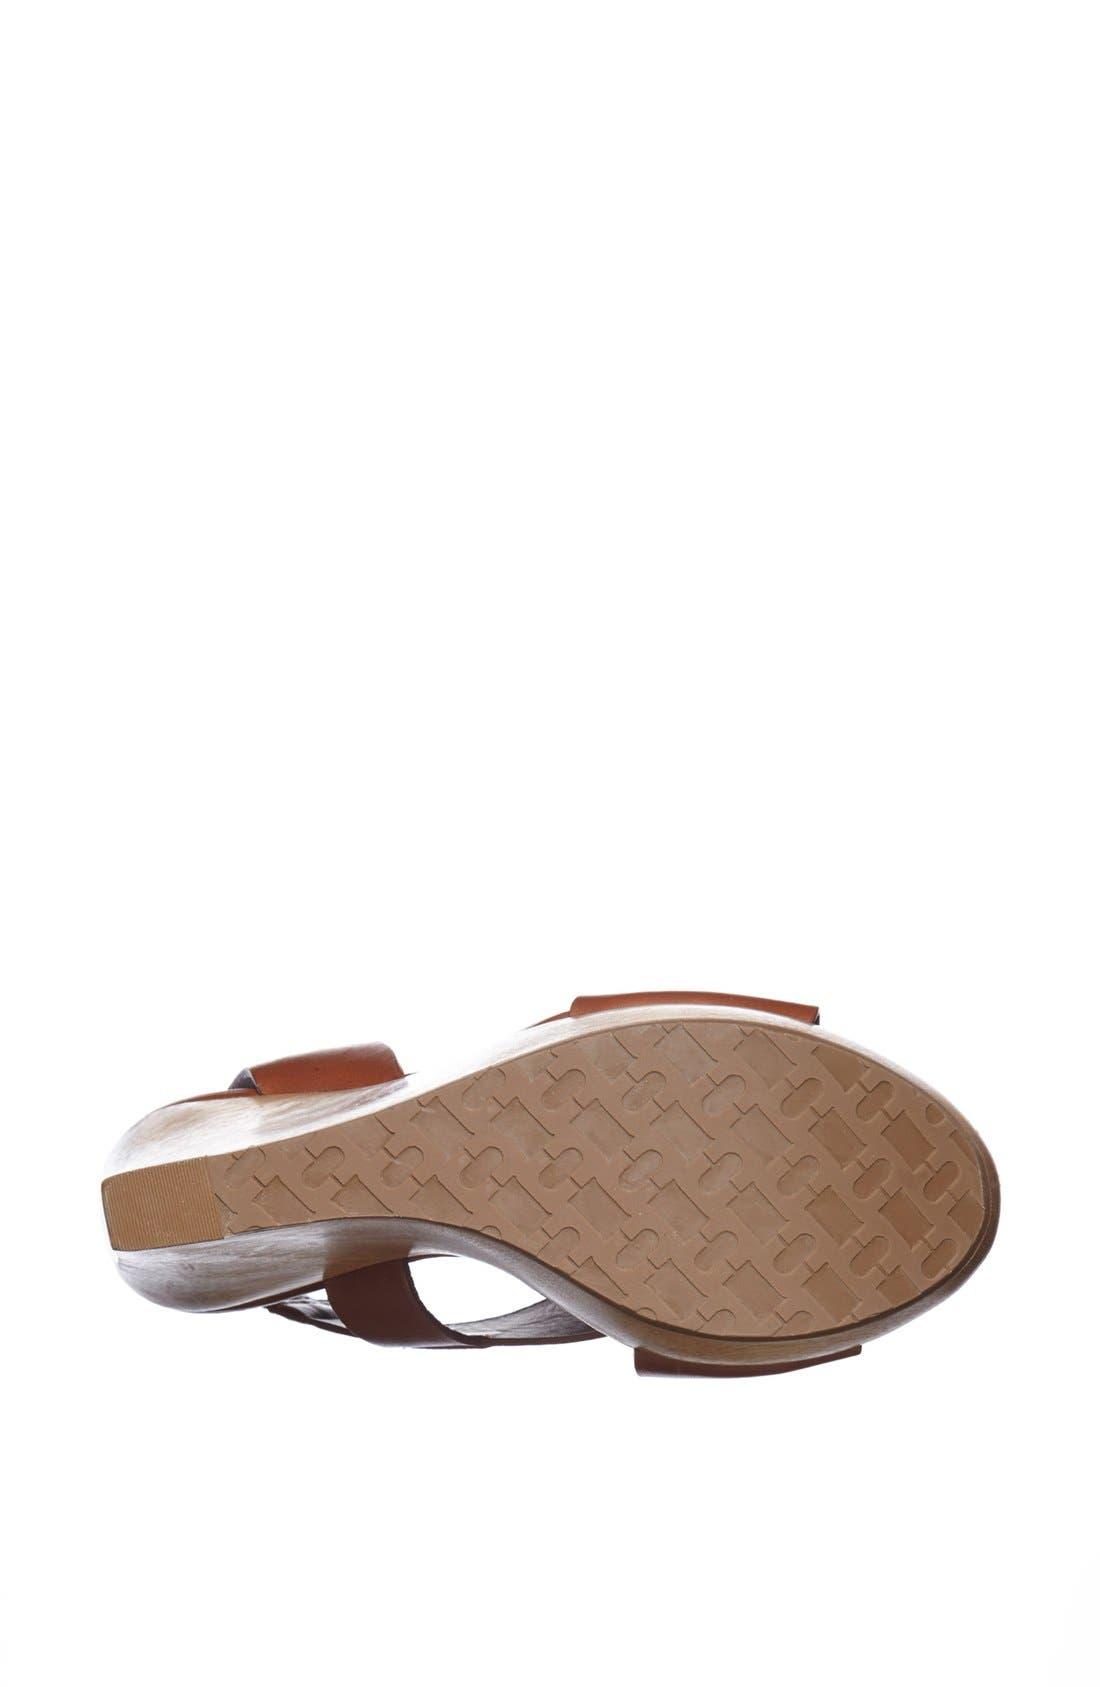 Alternate Image 3  - Diane von Furstenberg 'Sunny' Wedge Sandal